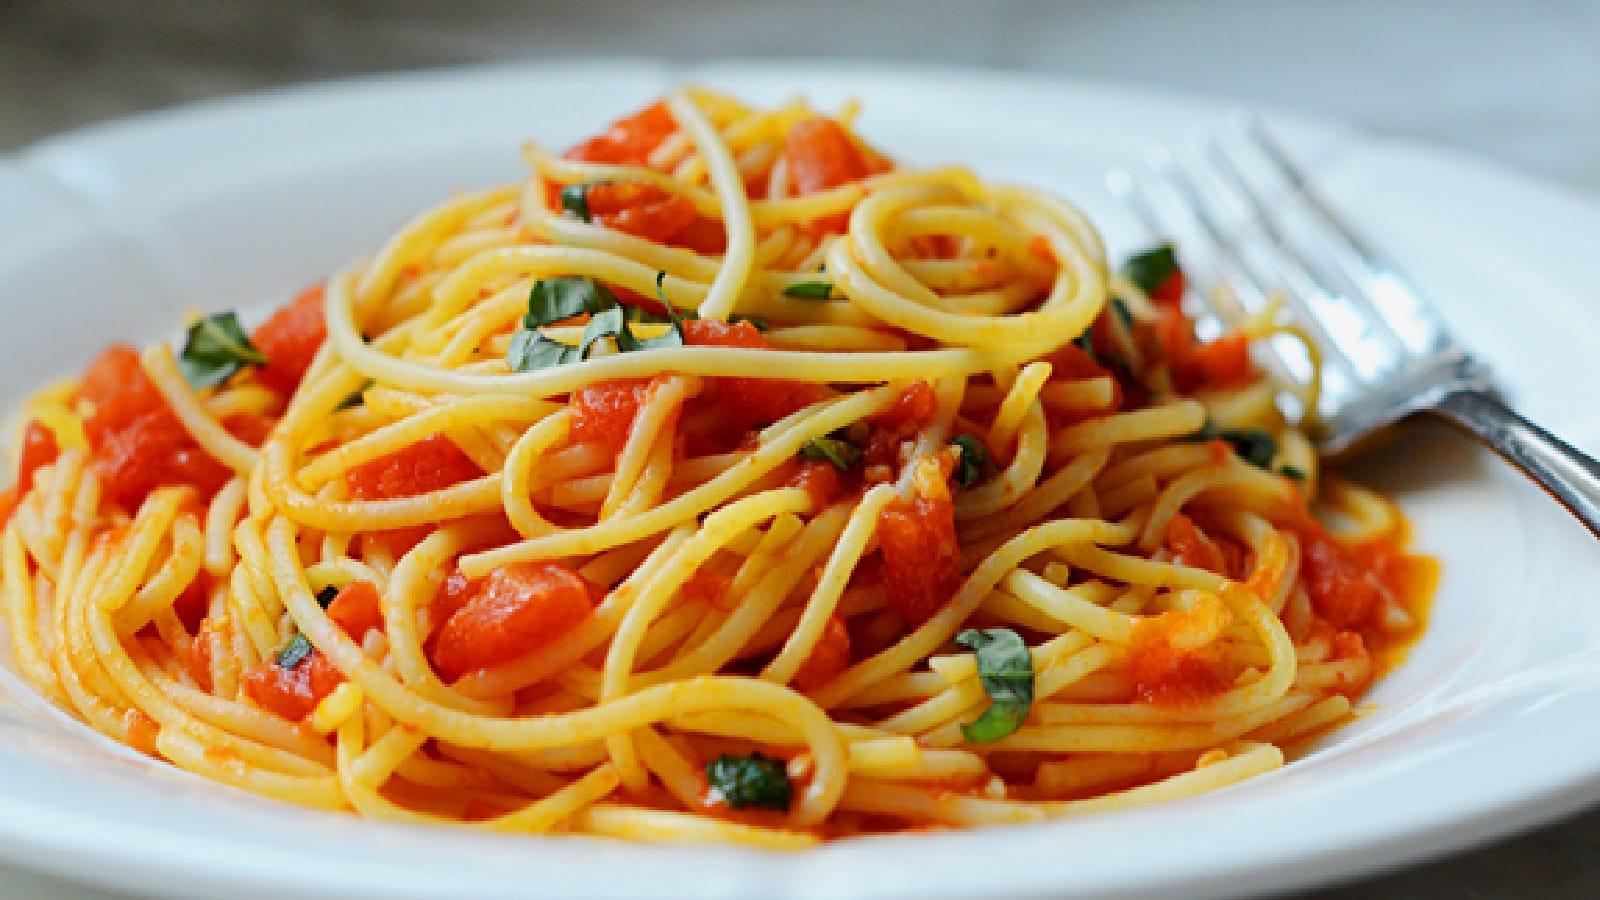 Spaghetti with homemade tomato basil sauce.